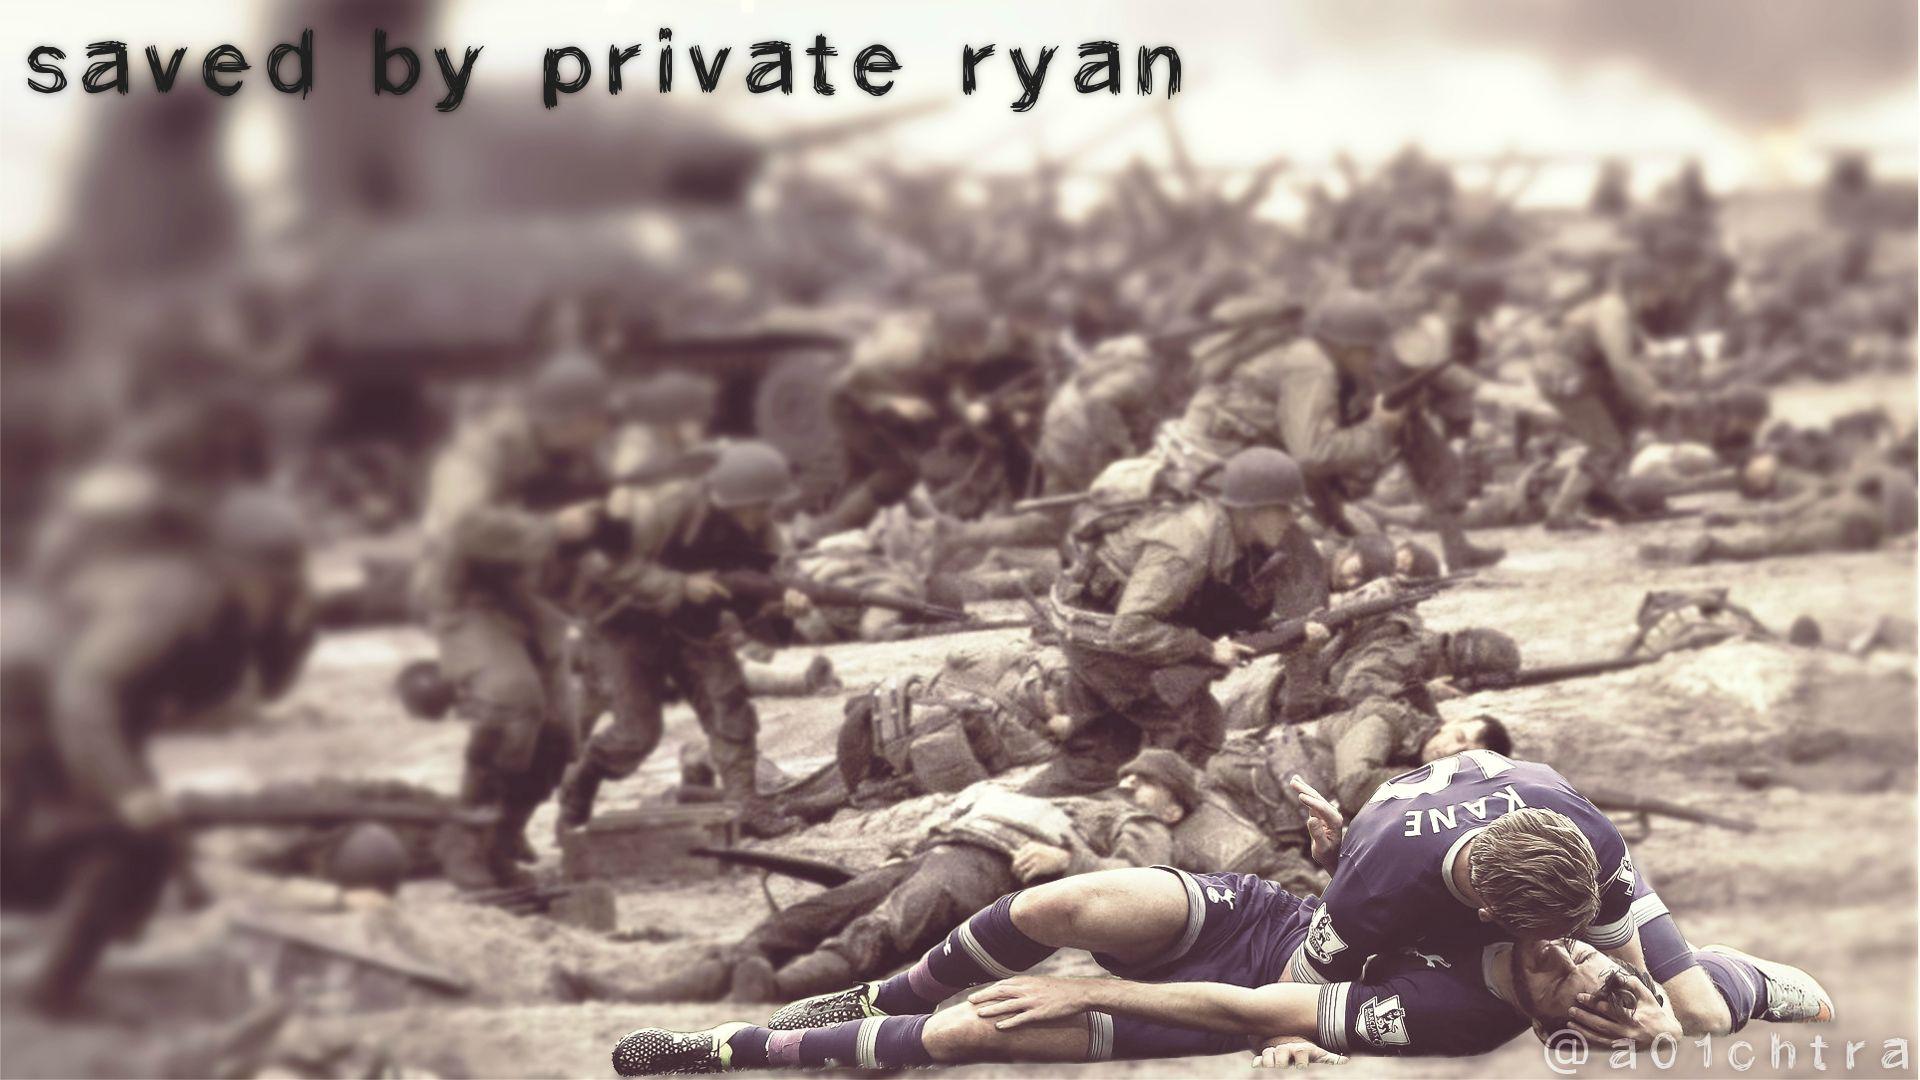 Ryan.jpg